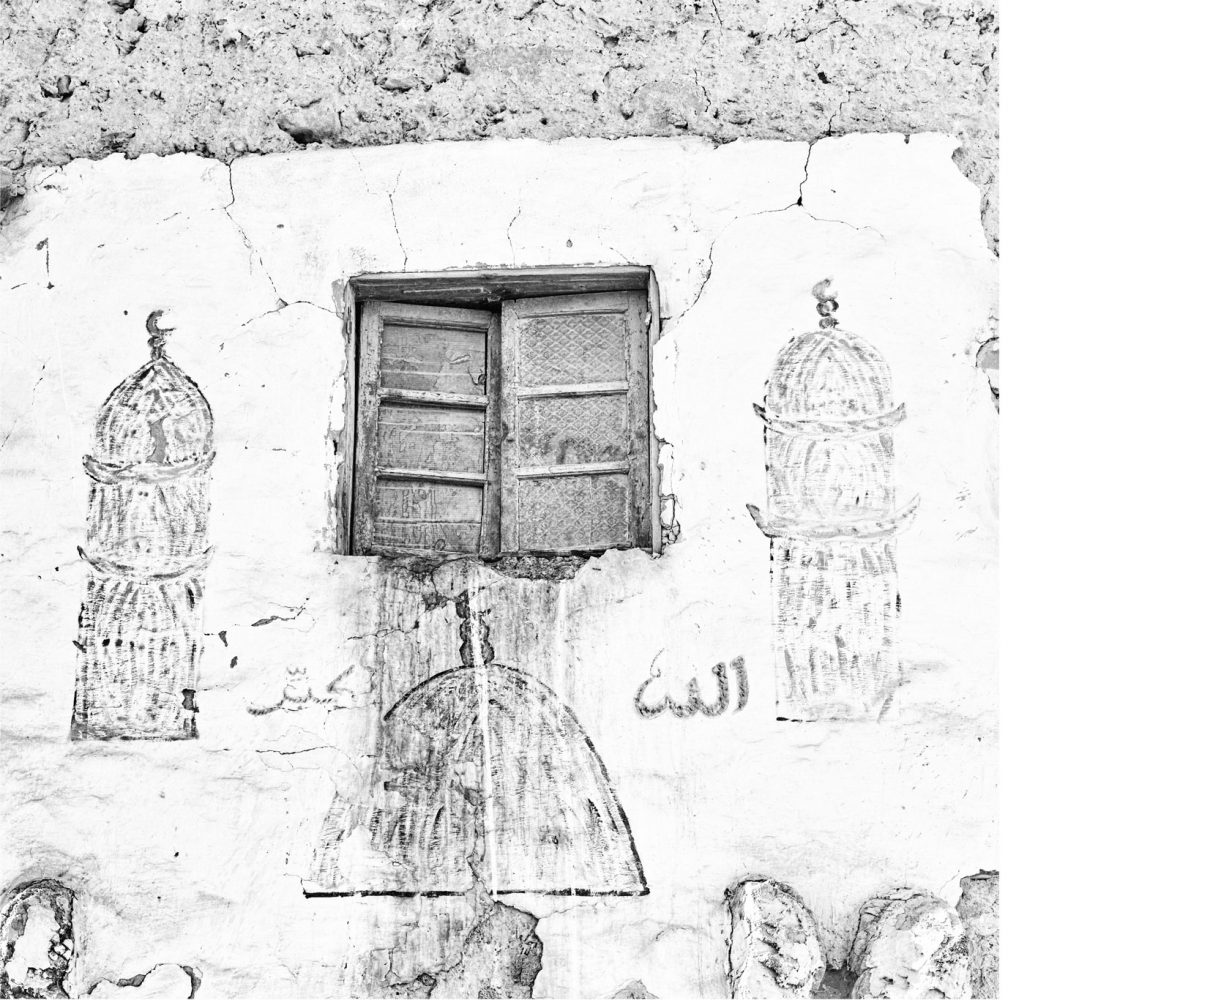 egypt_b&w_thevoyageur16